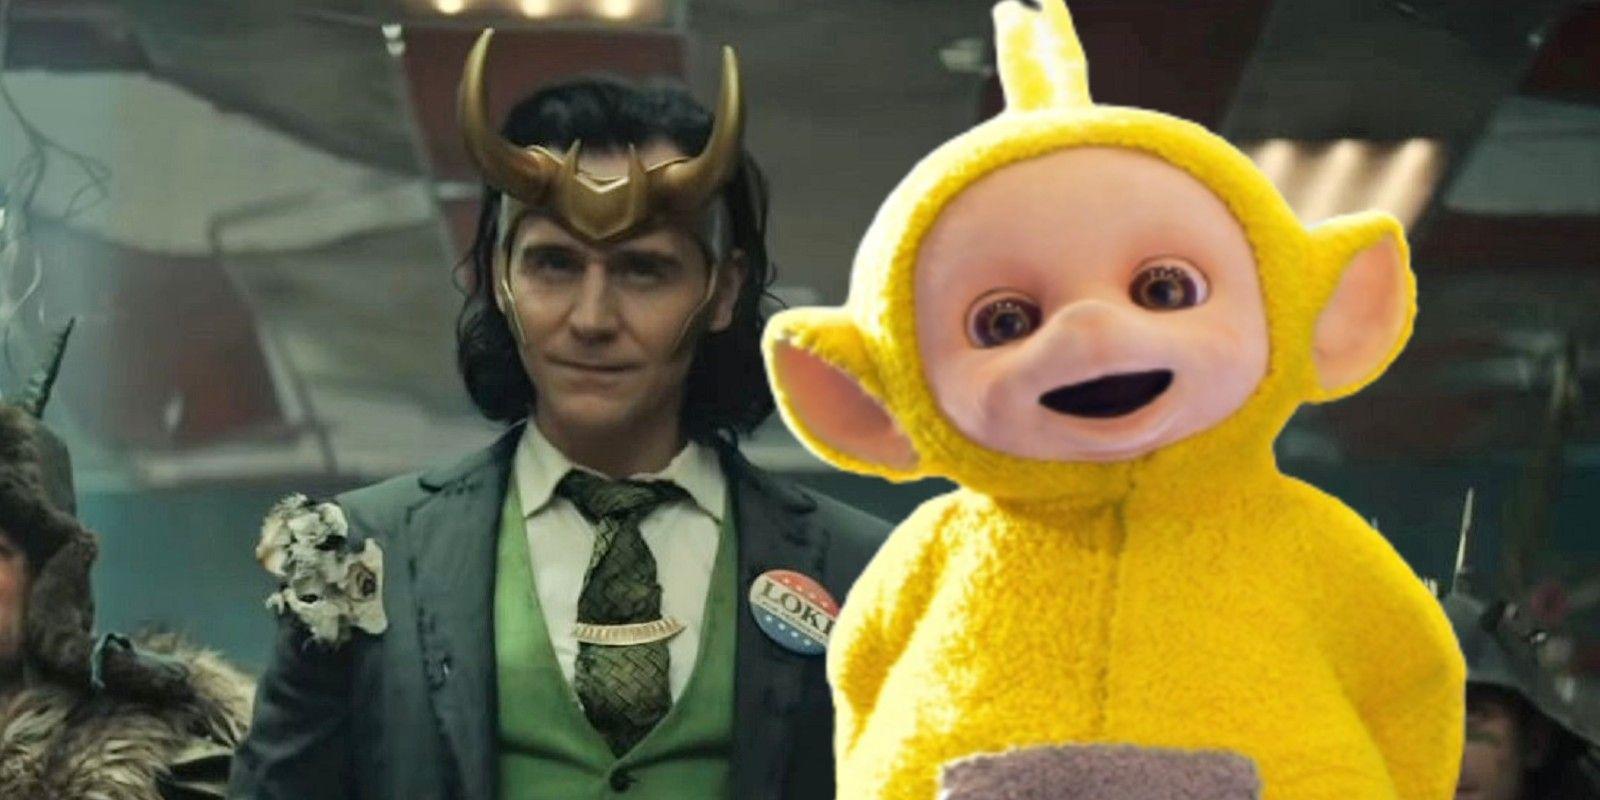 Loki Director Reveals The Teletubbies Helped Inspire Disney+ Show